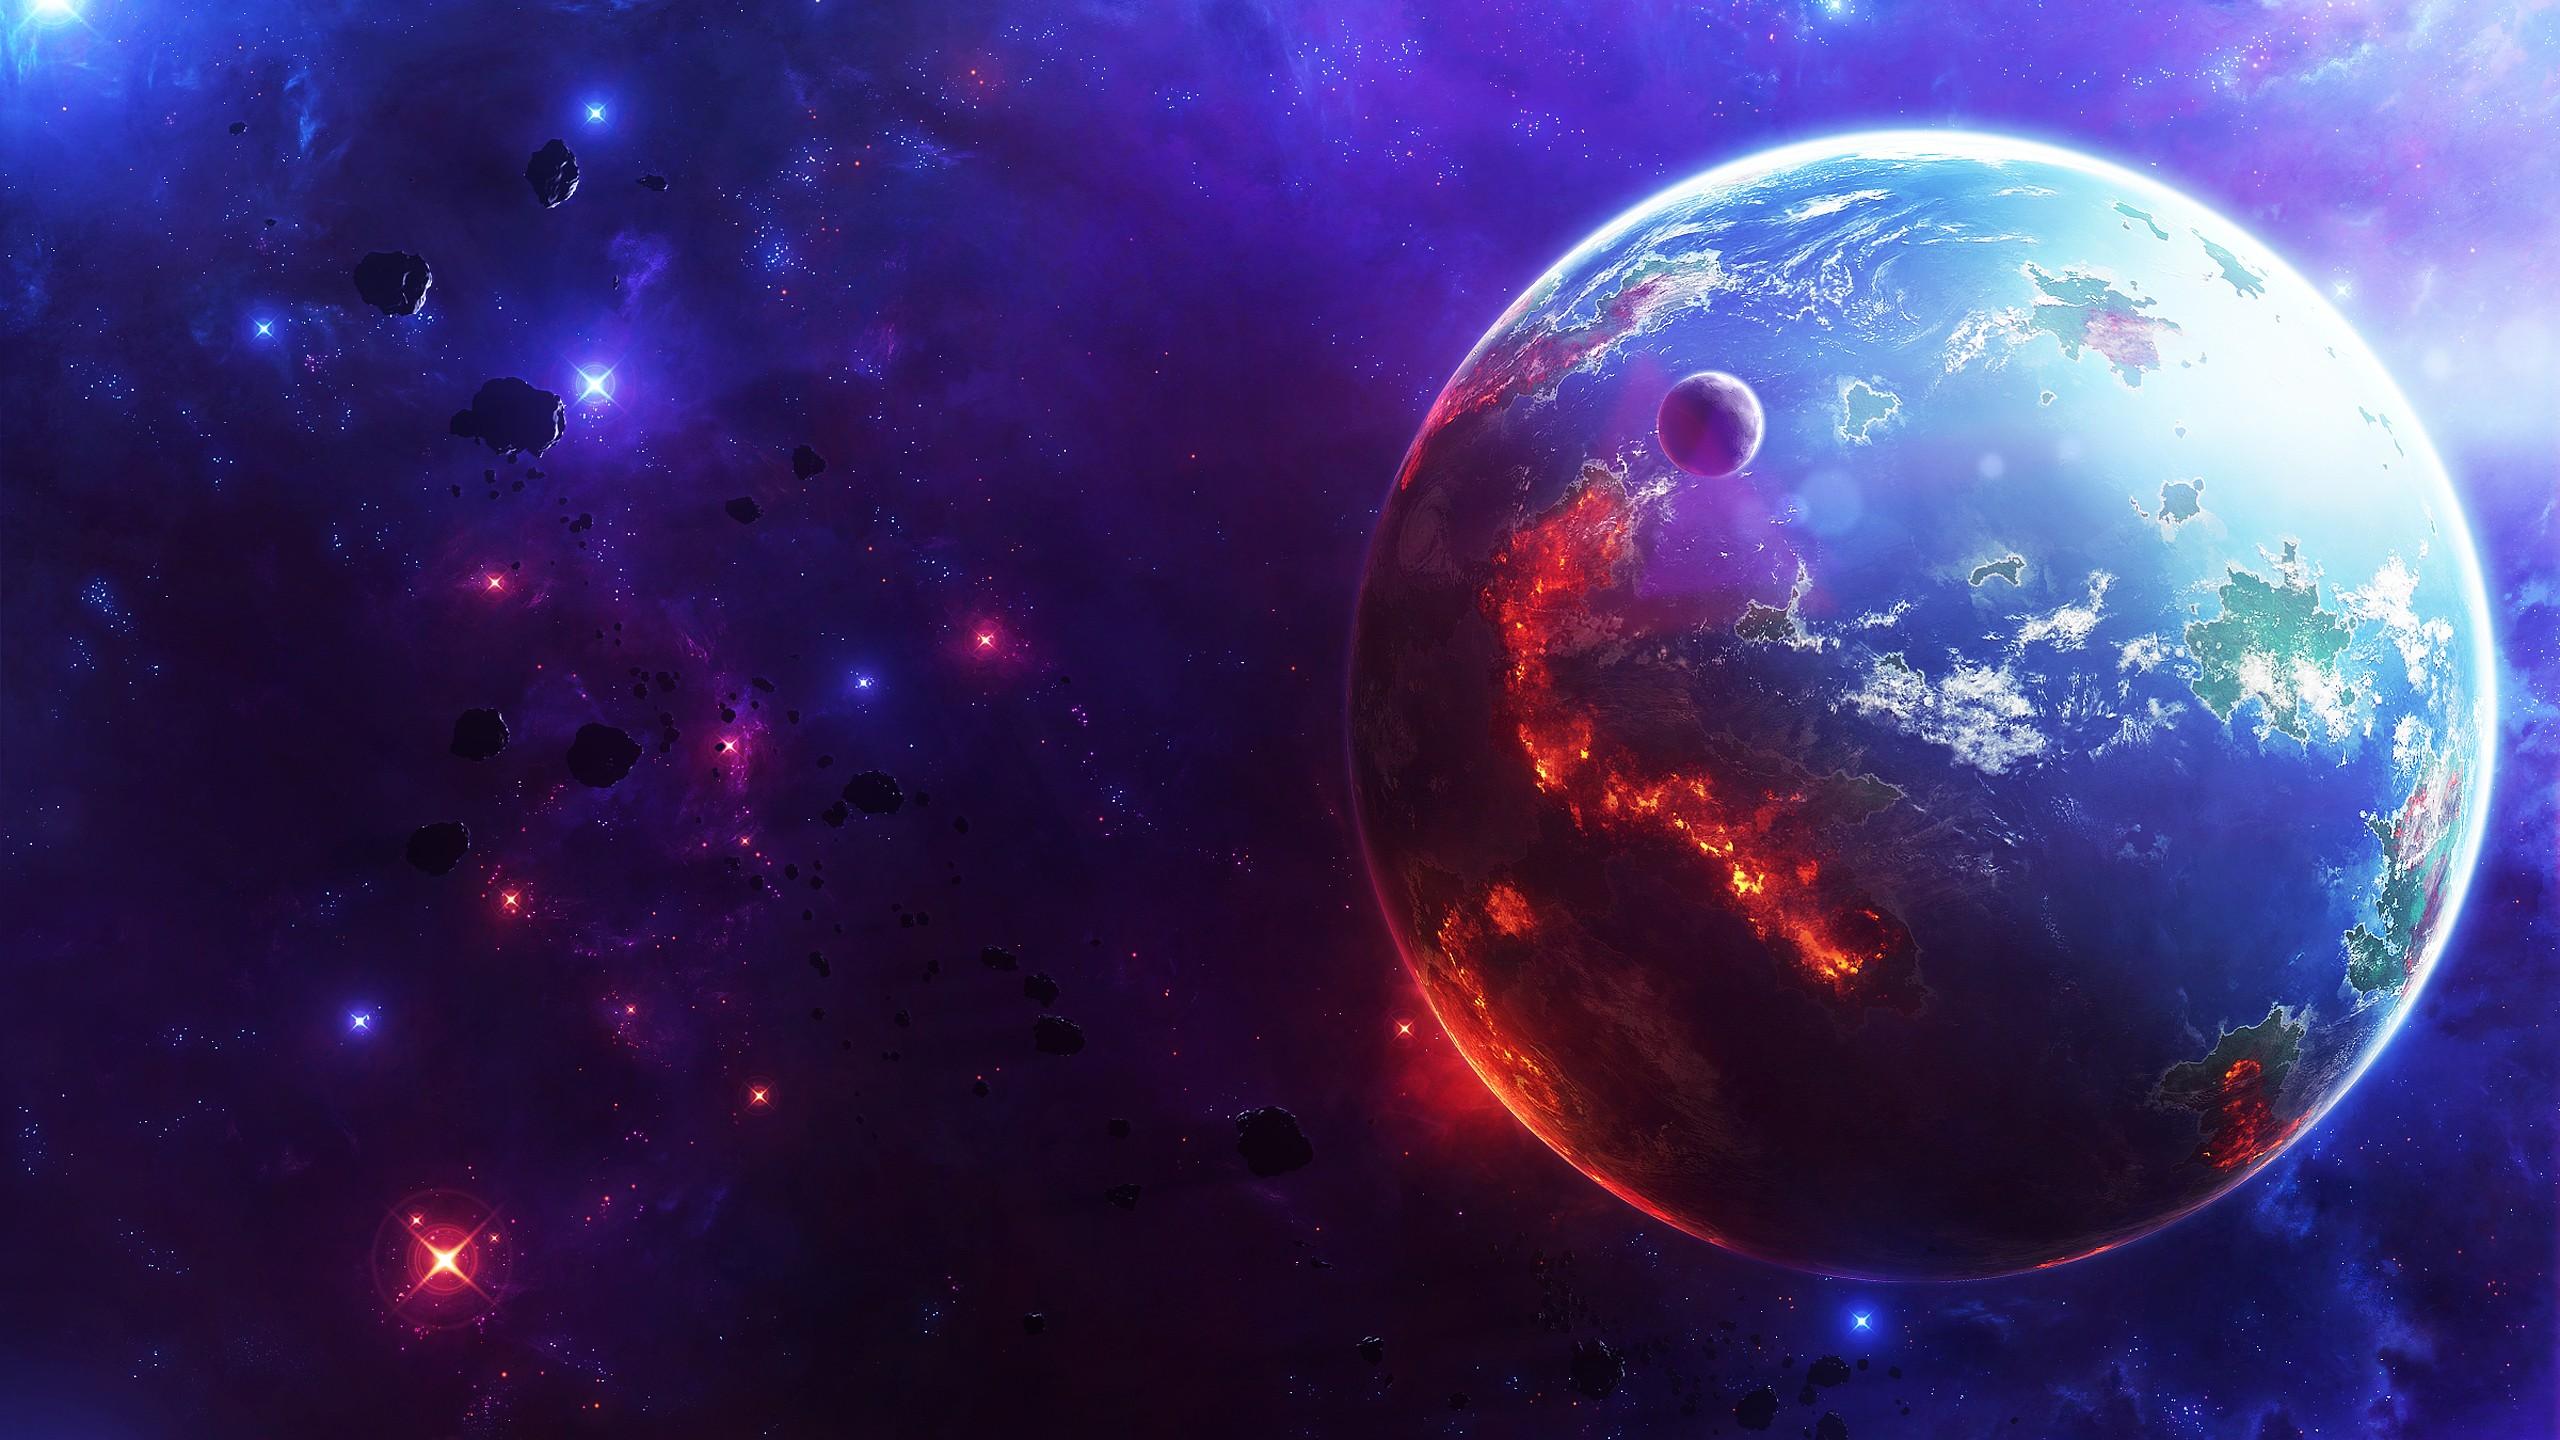 Cute Wallpaper Widescreen Planet Extinction Wallpapers Hd Wallpapers Id 28944